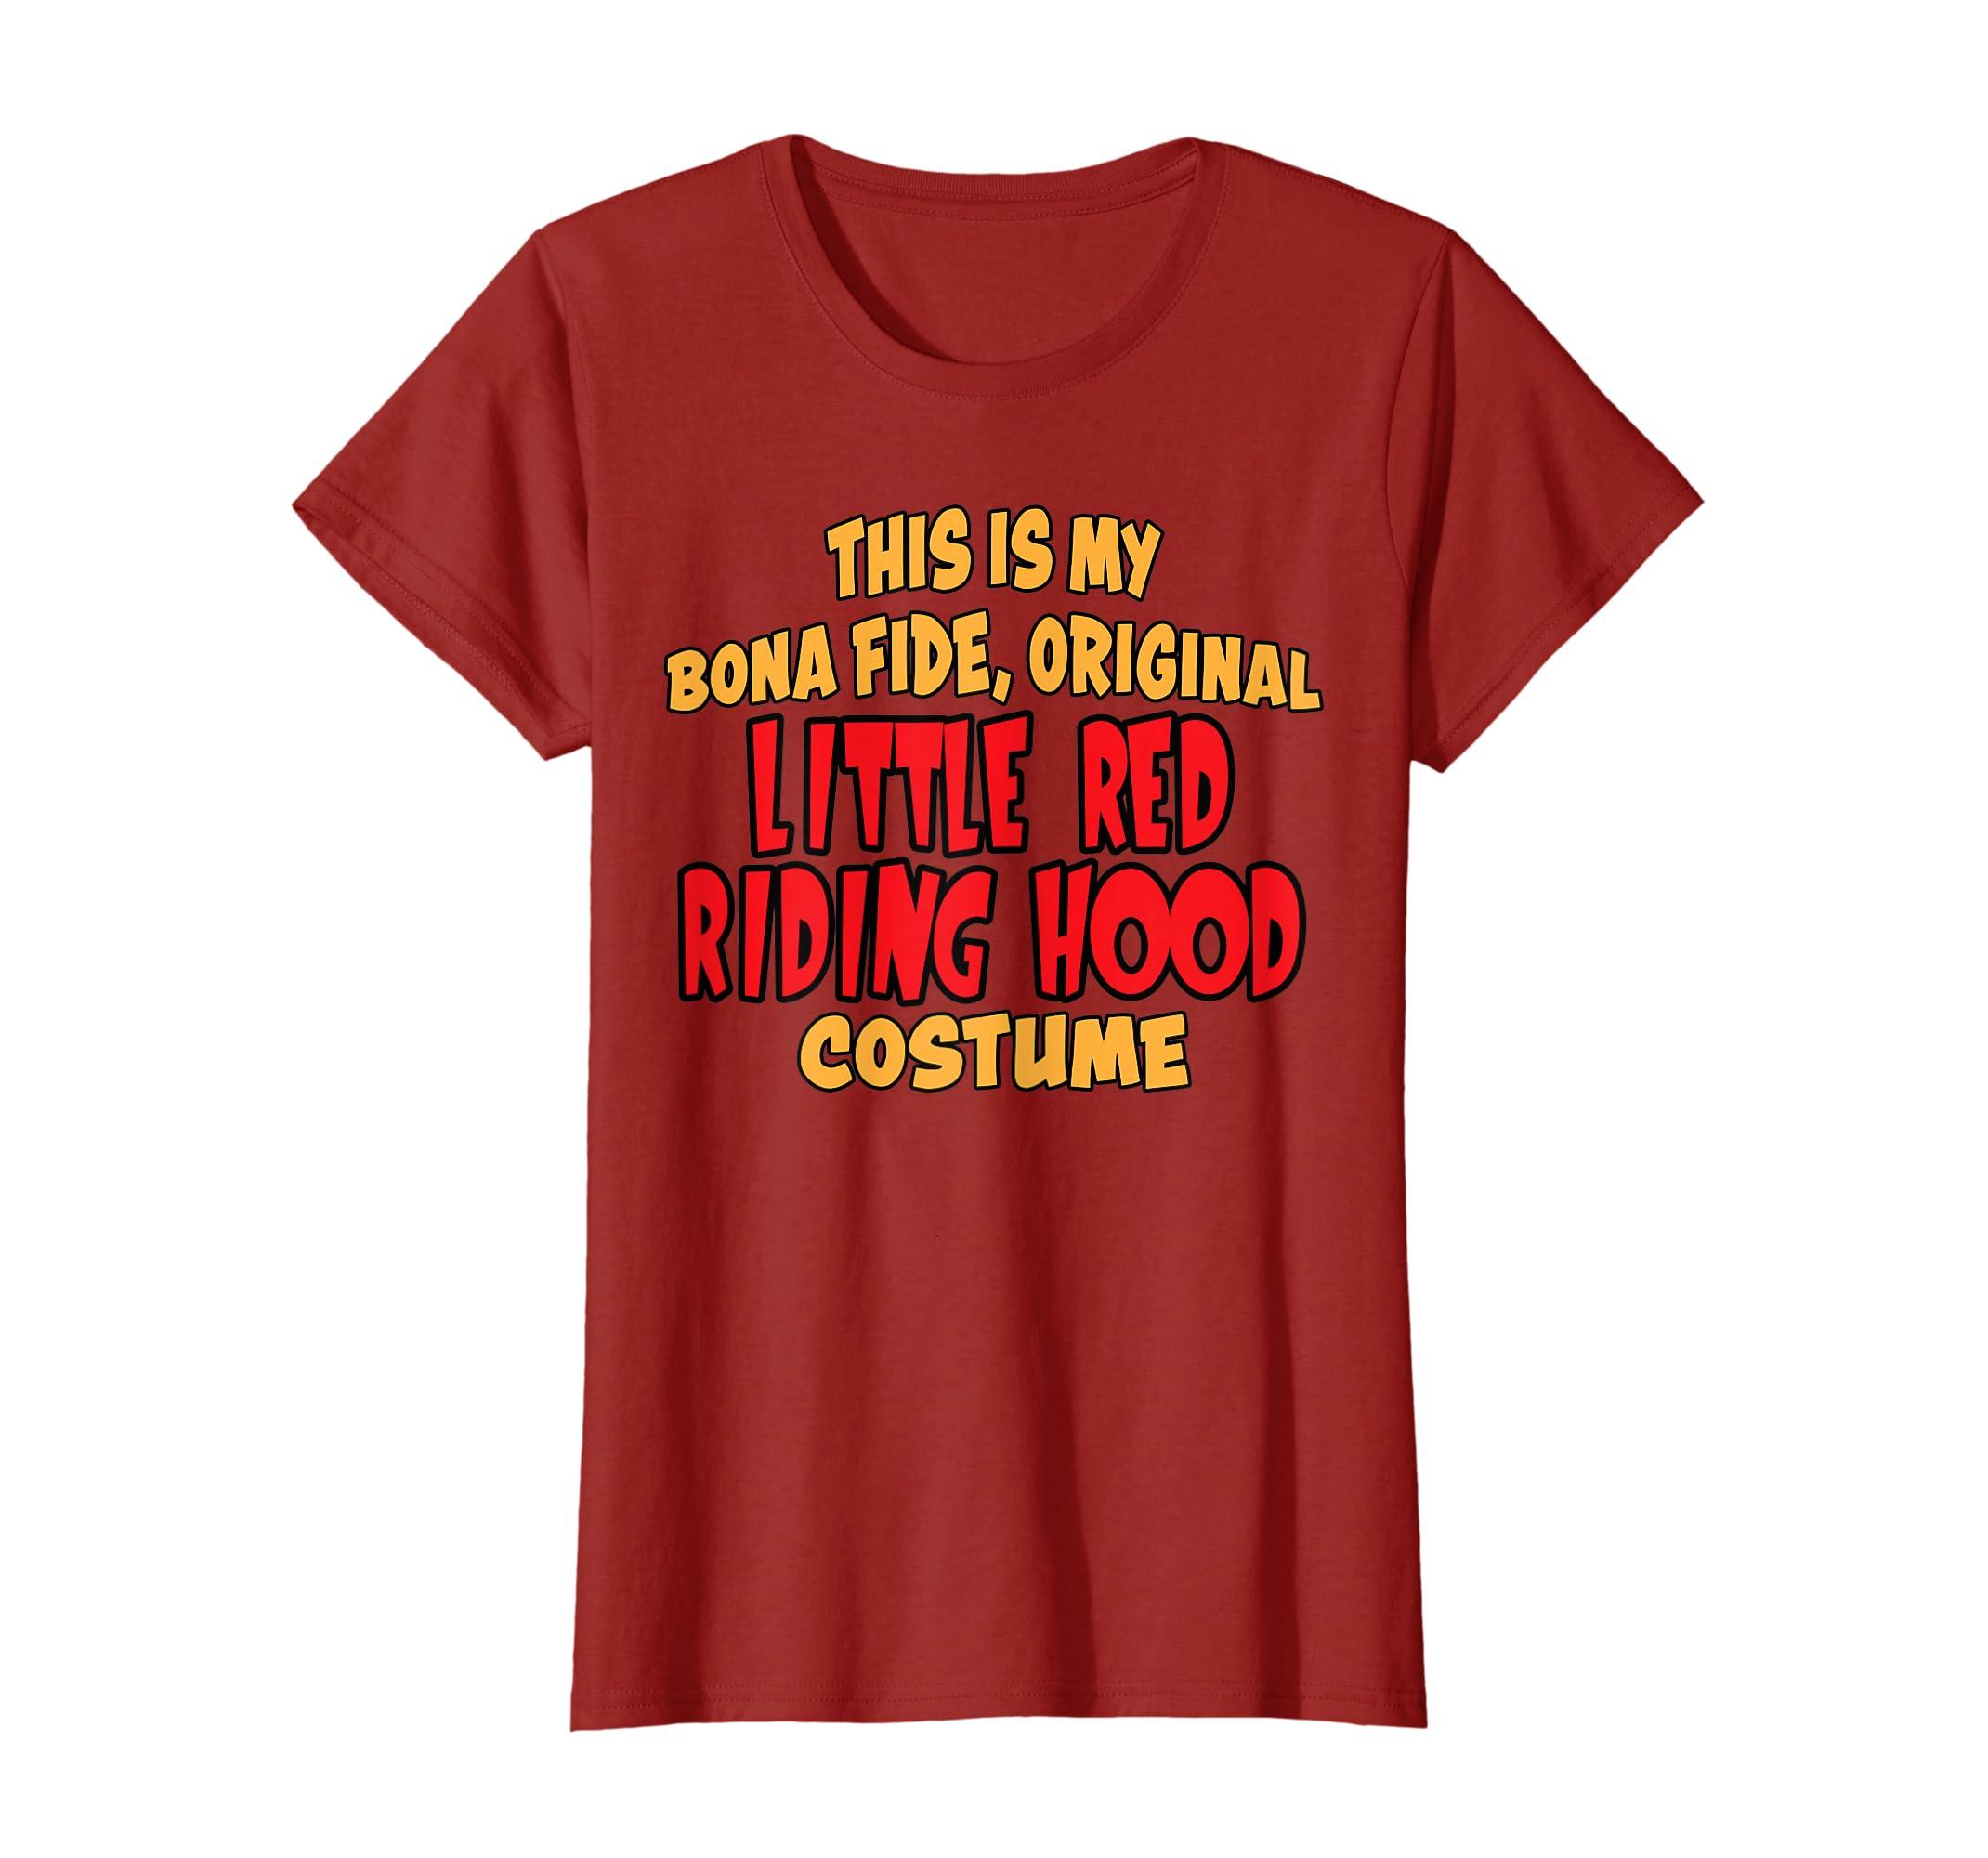 ec6a3eea Amazon.com: Bona Fide Original Little Red Riding Hood Costume T-shirt:  Clothing